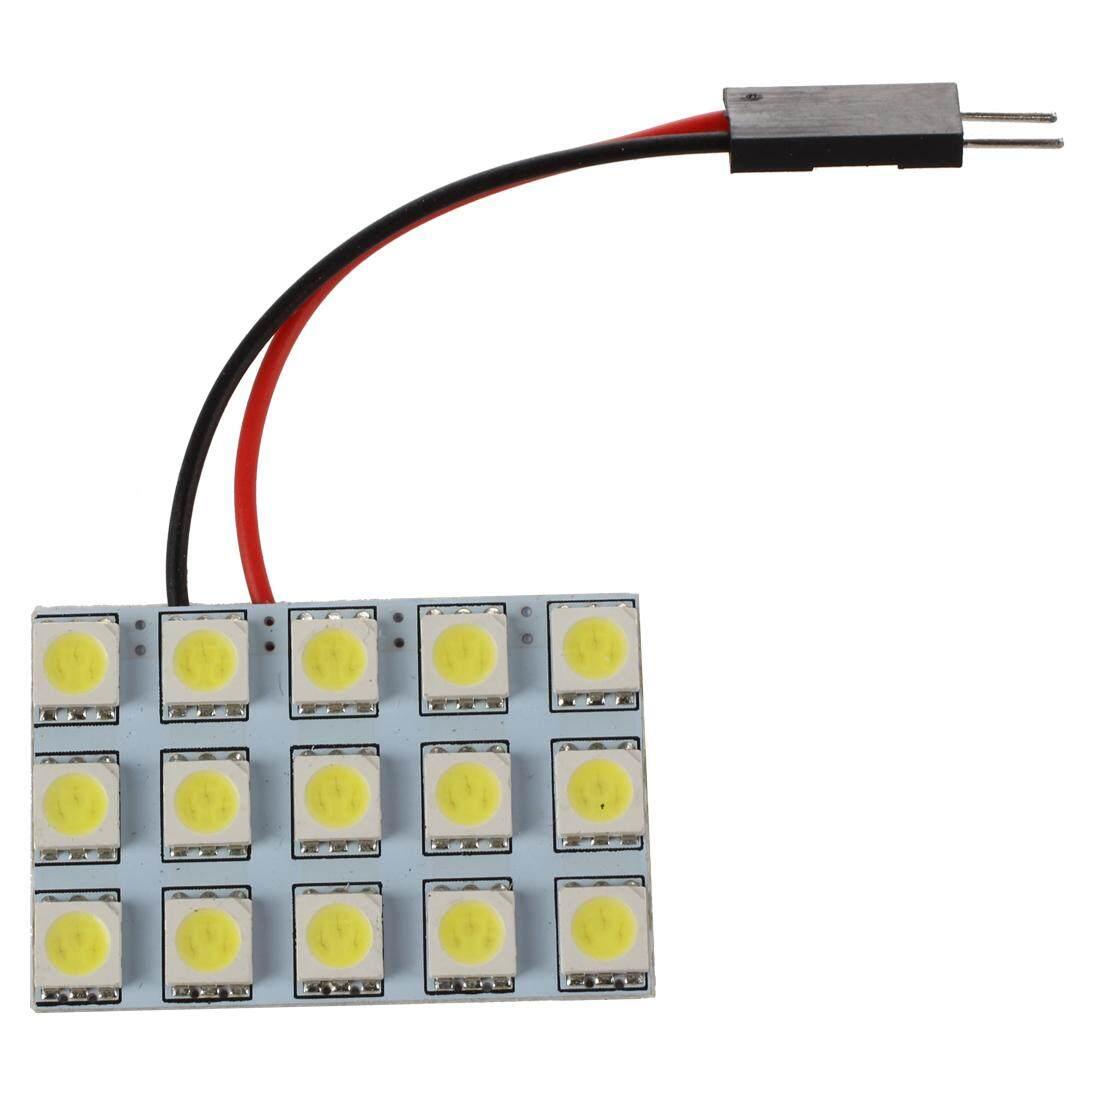 Buying 1bh Led Kabin Plafon Mobil Interior Socket Festoon T10 Ice Universal 6 2x Car Light Panel 15 Smd 5050 Ba9s Dome Bulb Adapter